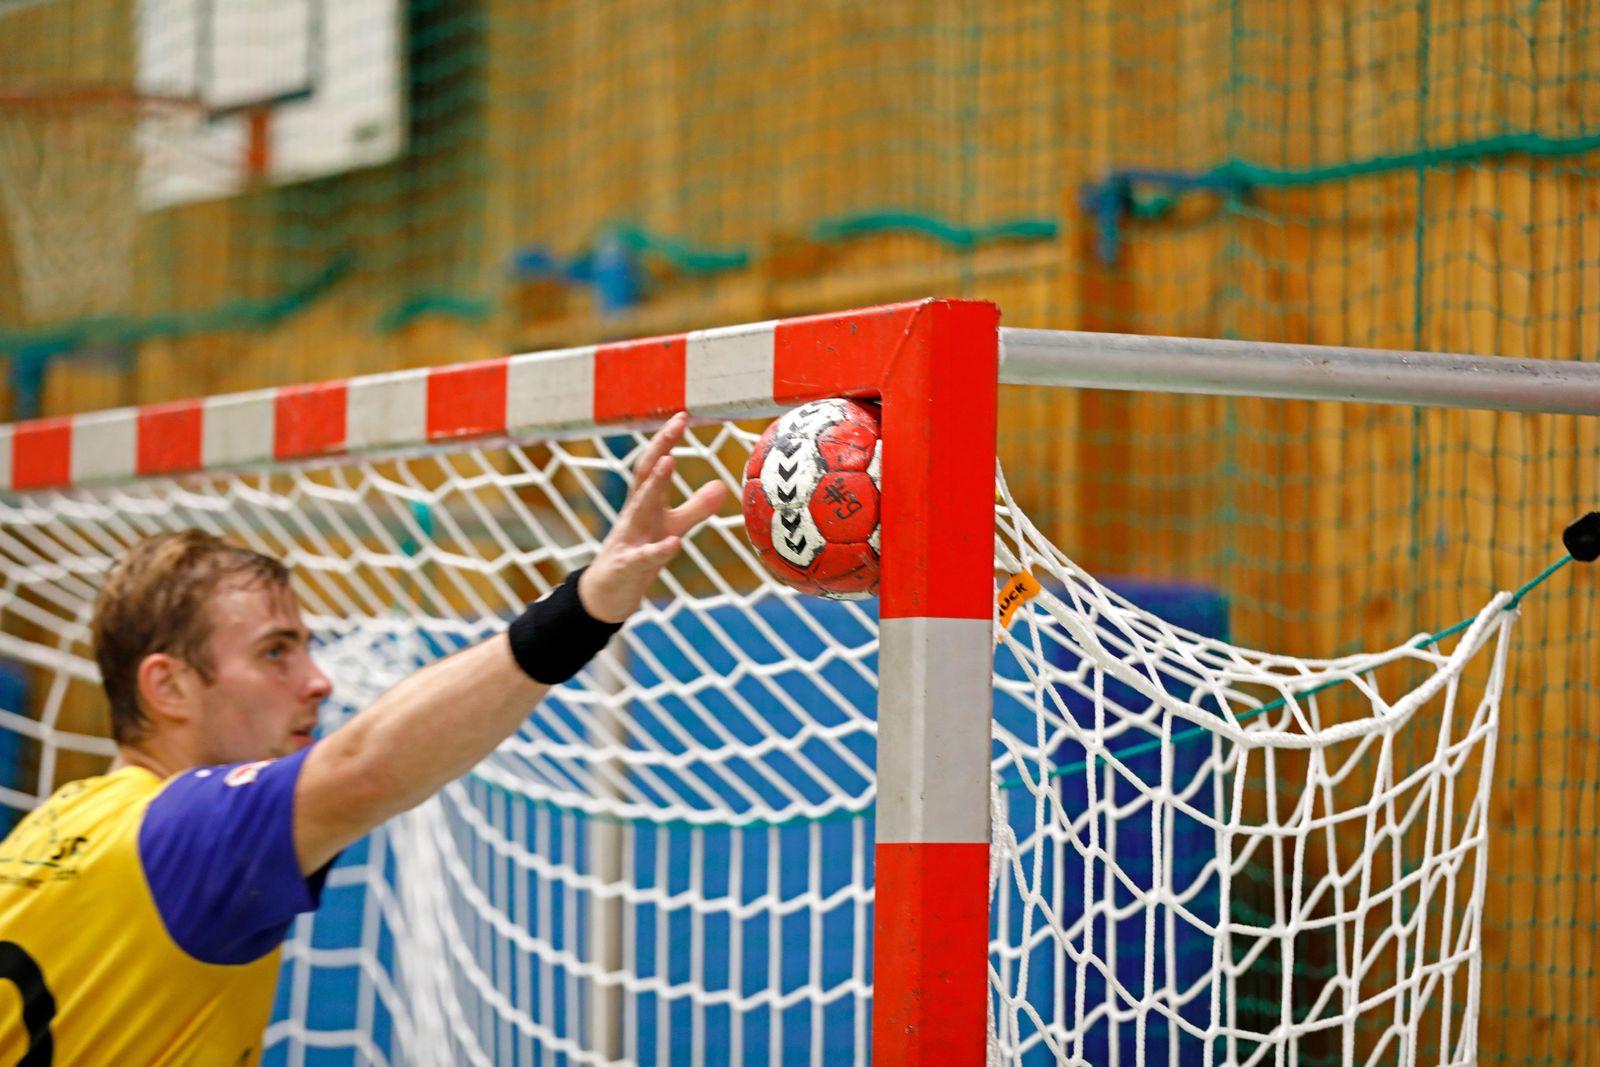 Handball bleibt im Lattenkreuz stecken